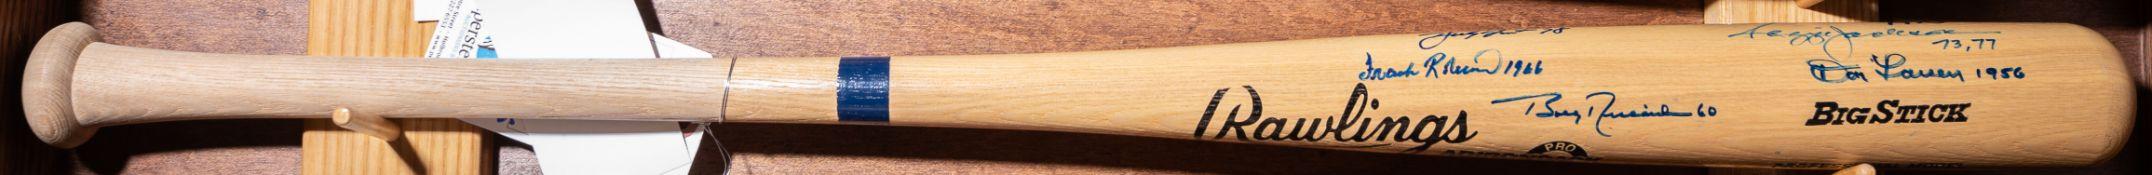 Autographed Rawlings Adirondack Wood Baseball Bat Signed By Various World Series MVP Winners